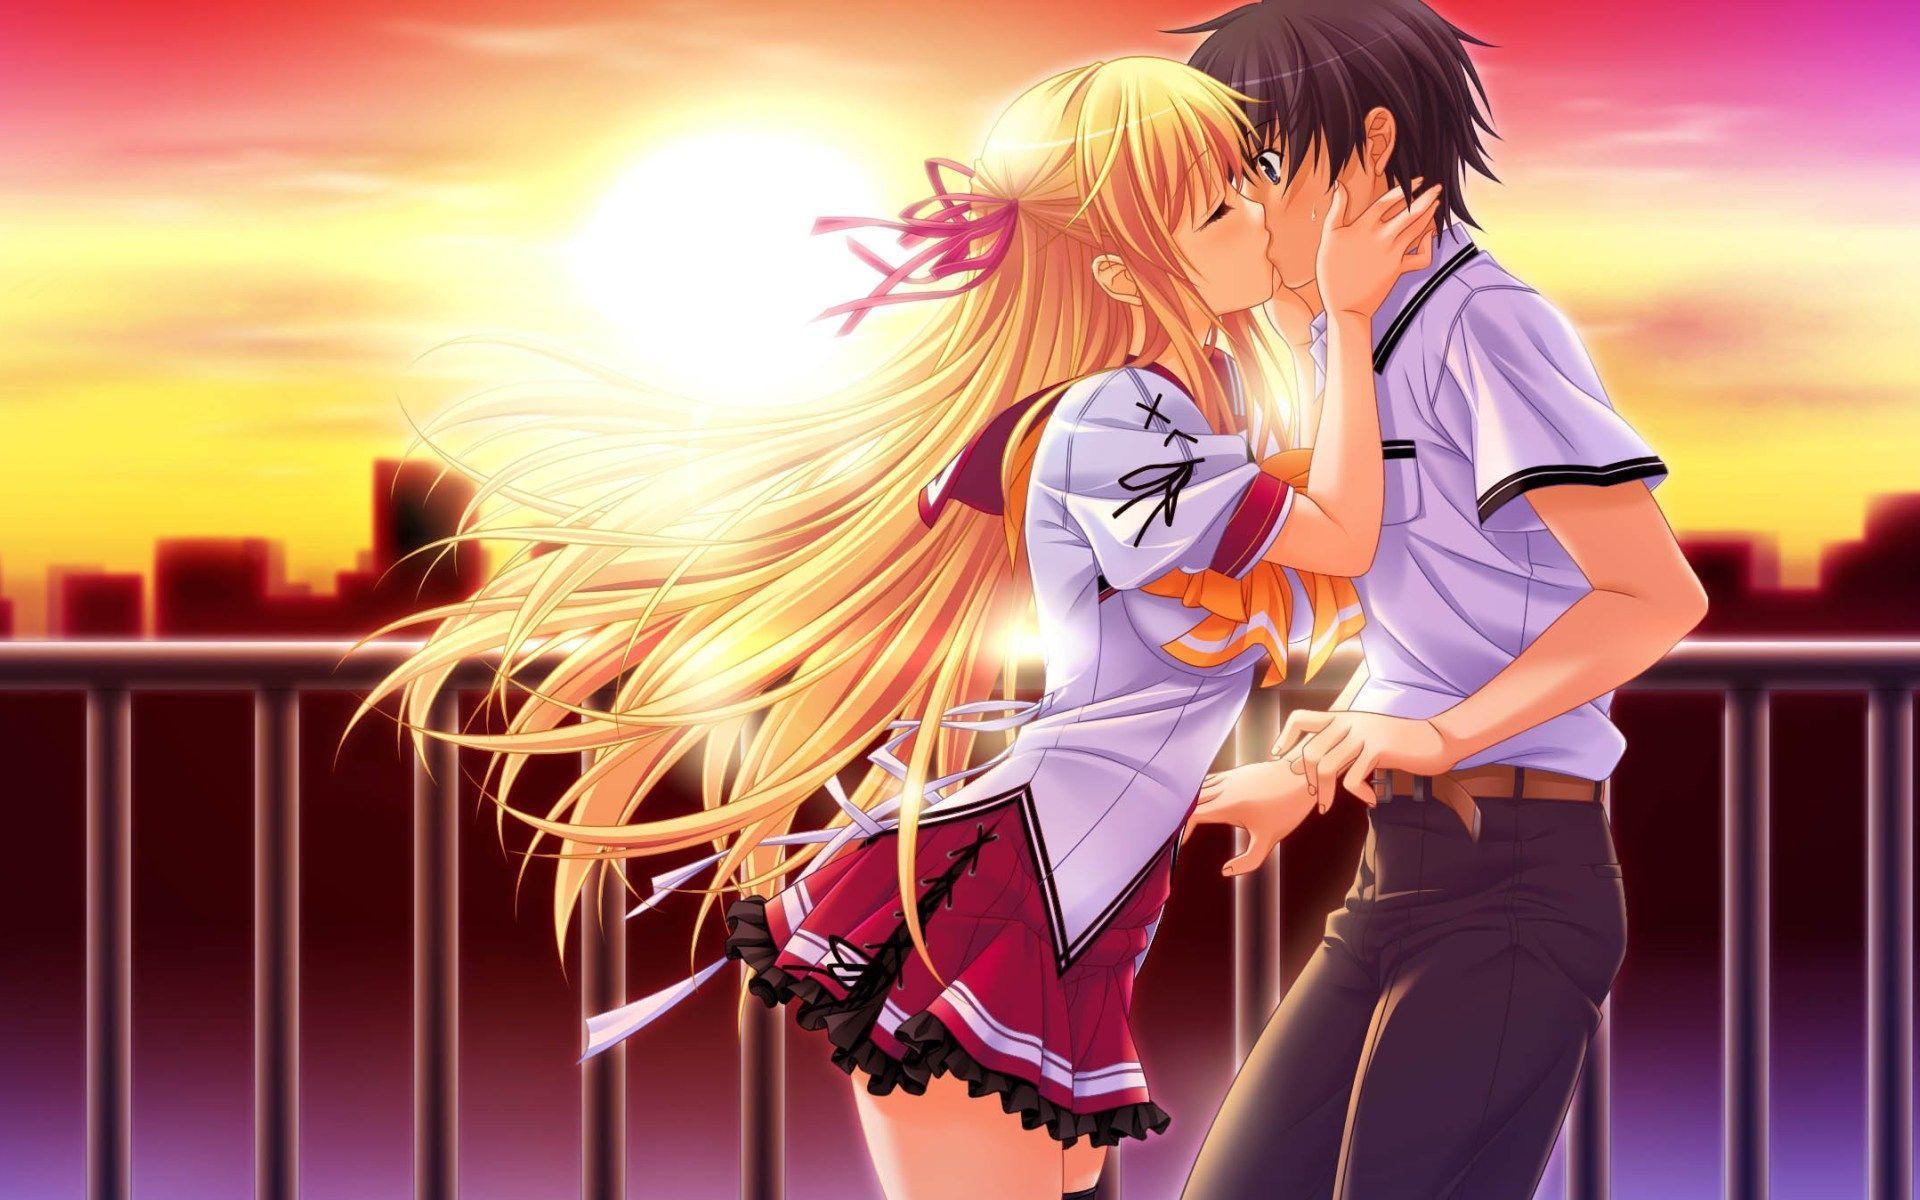 Best Romantic Cartoon Hd Wallpapers Secondtofirstcom